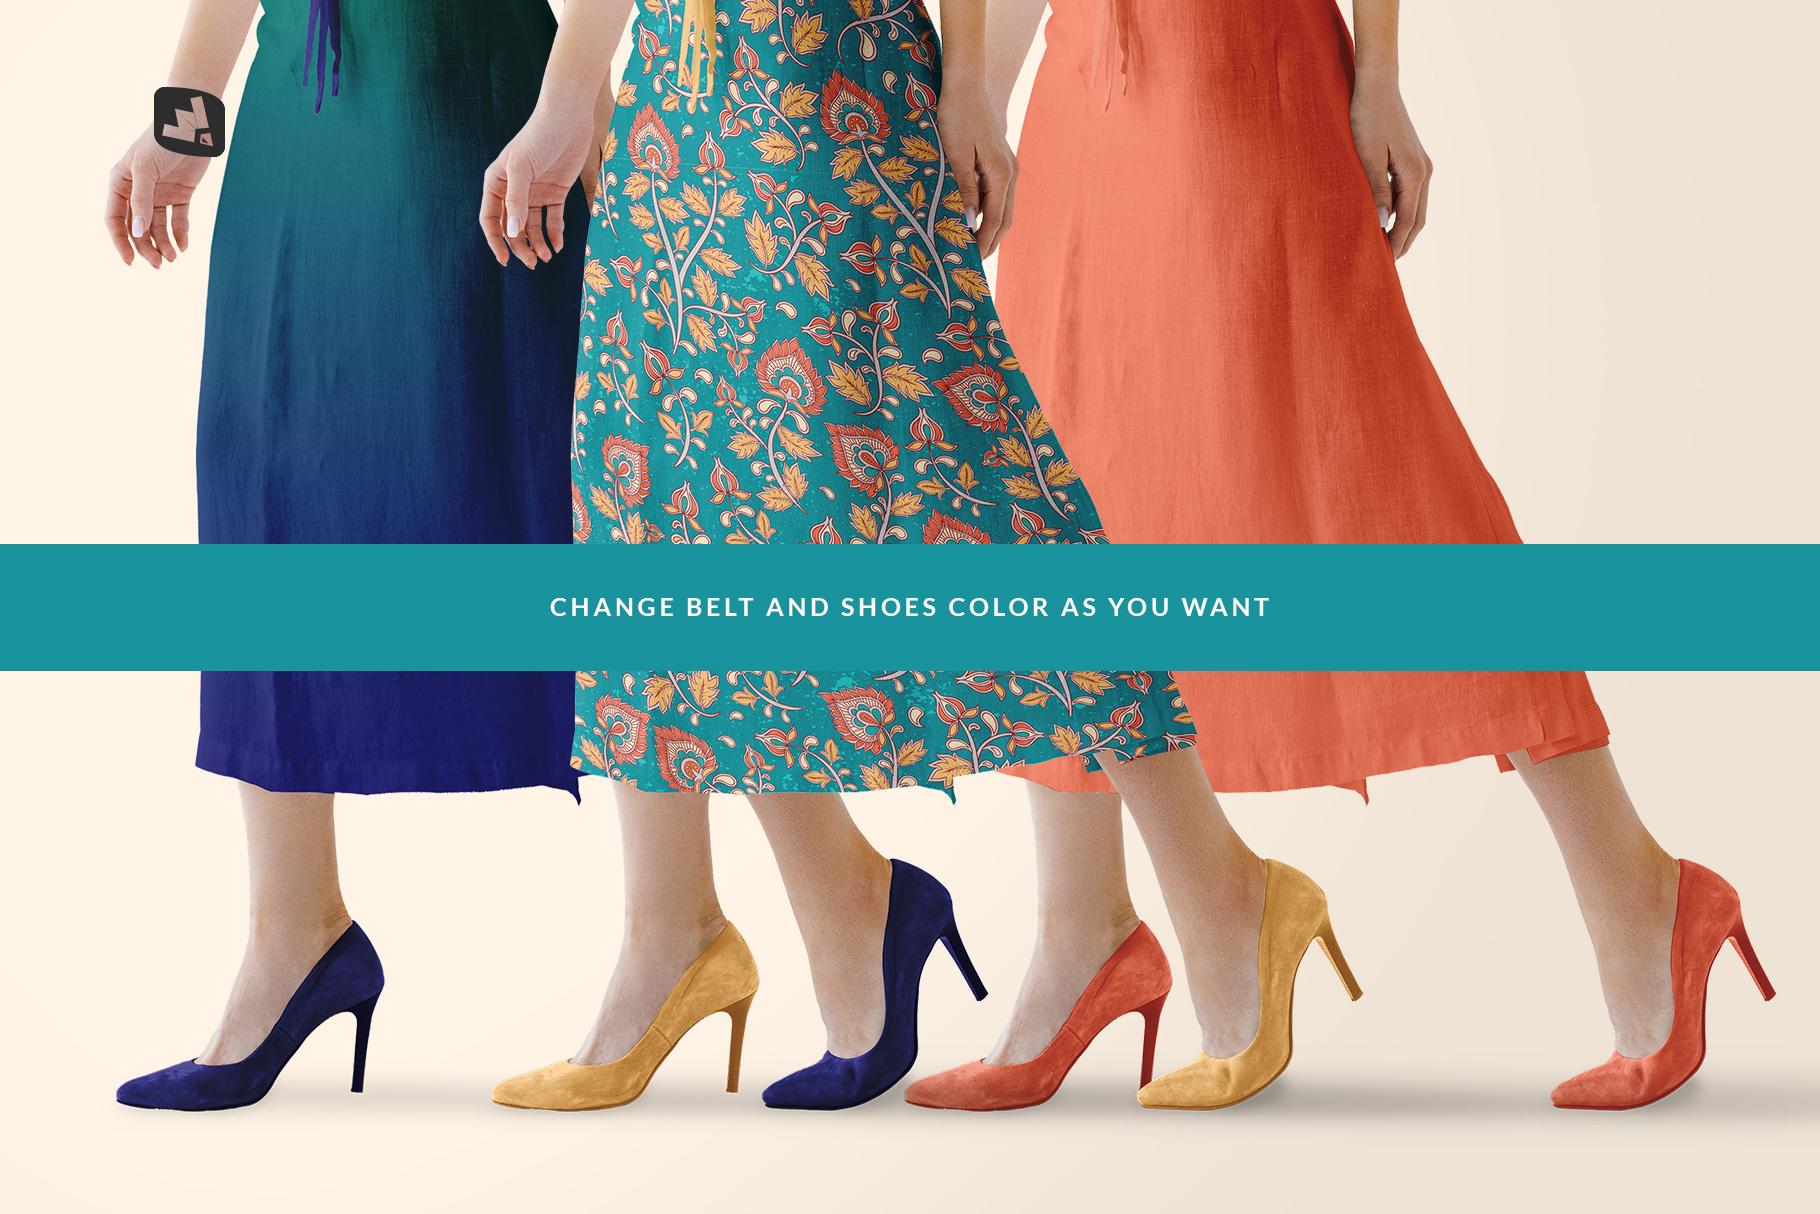 customizable shoe color of the women's summer dress mockup vol.3